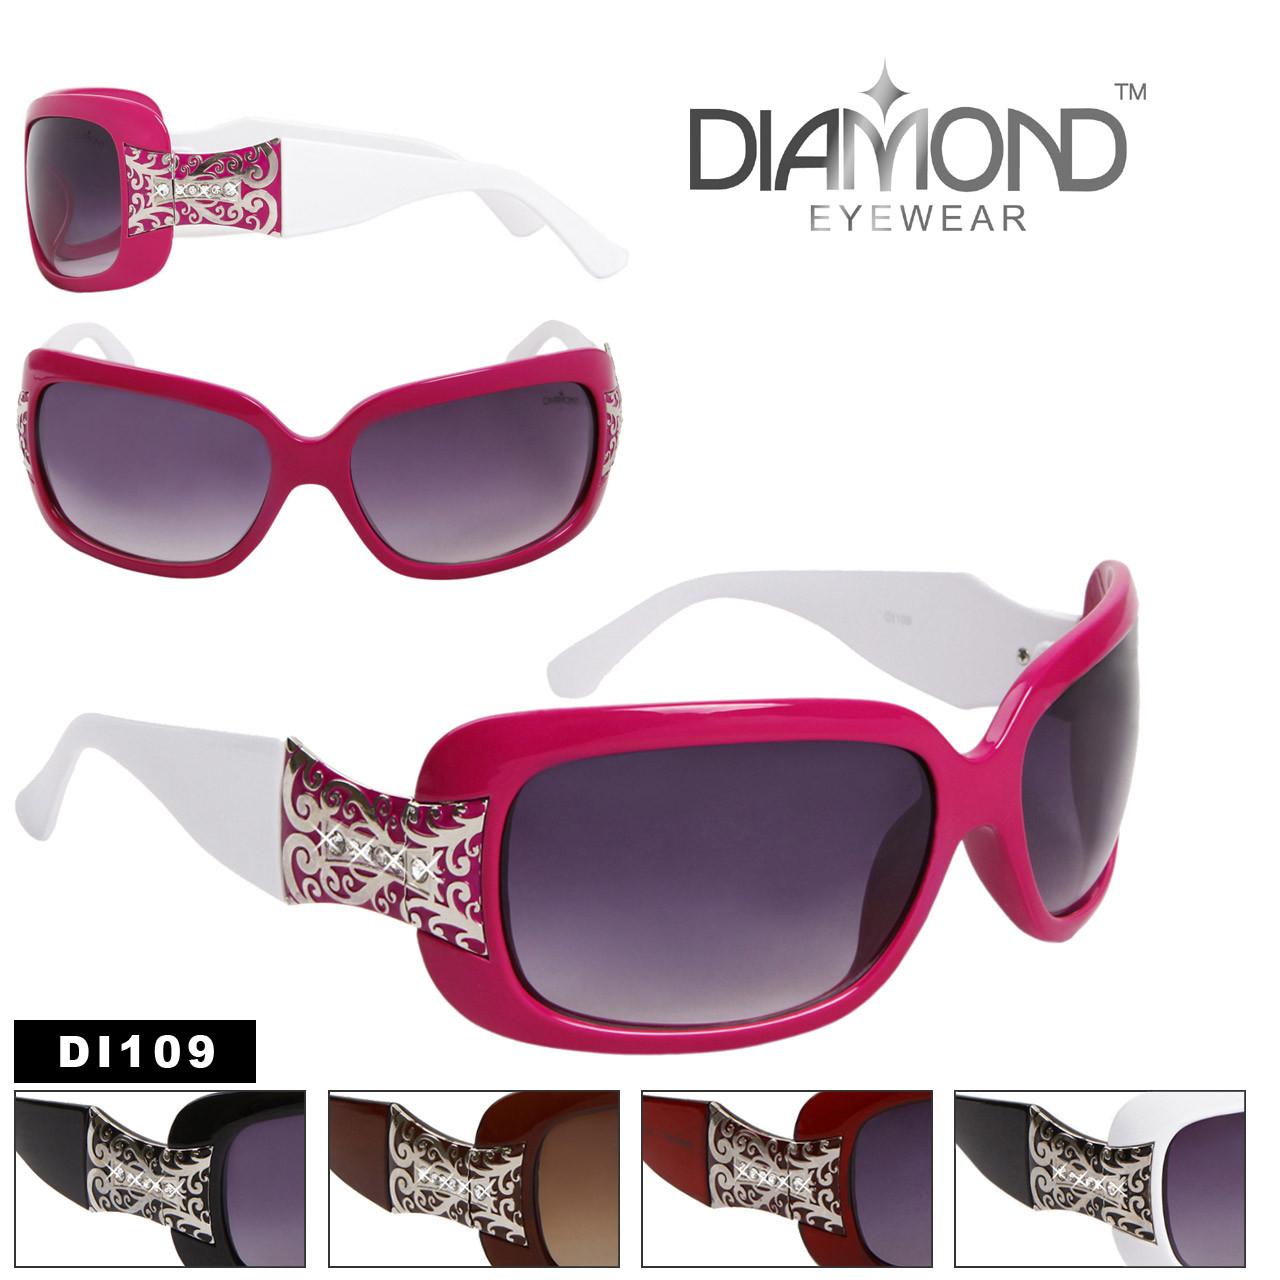 Diamond Eyewear DI109 Rhinestone Fashion Sunglasses (Assorted Colors) (12 pcs.)